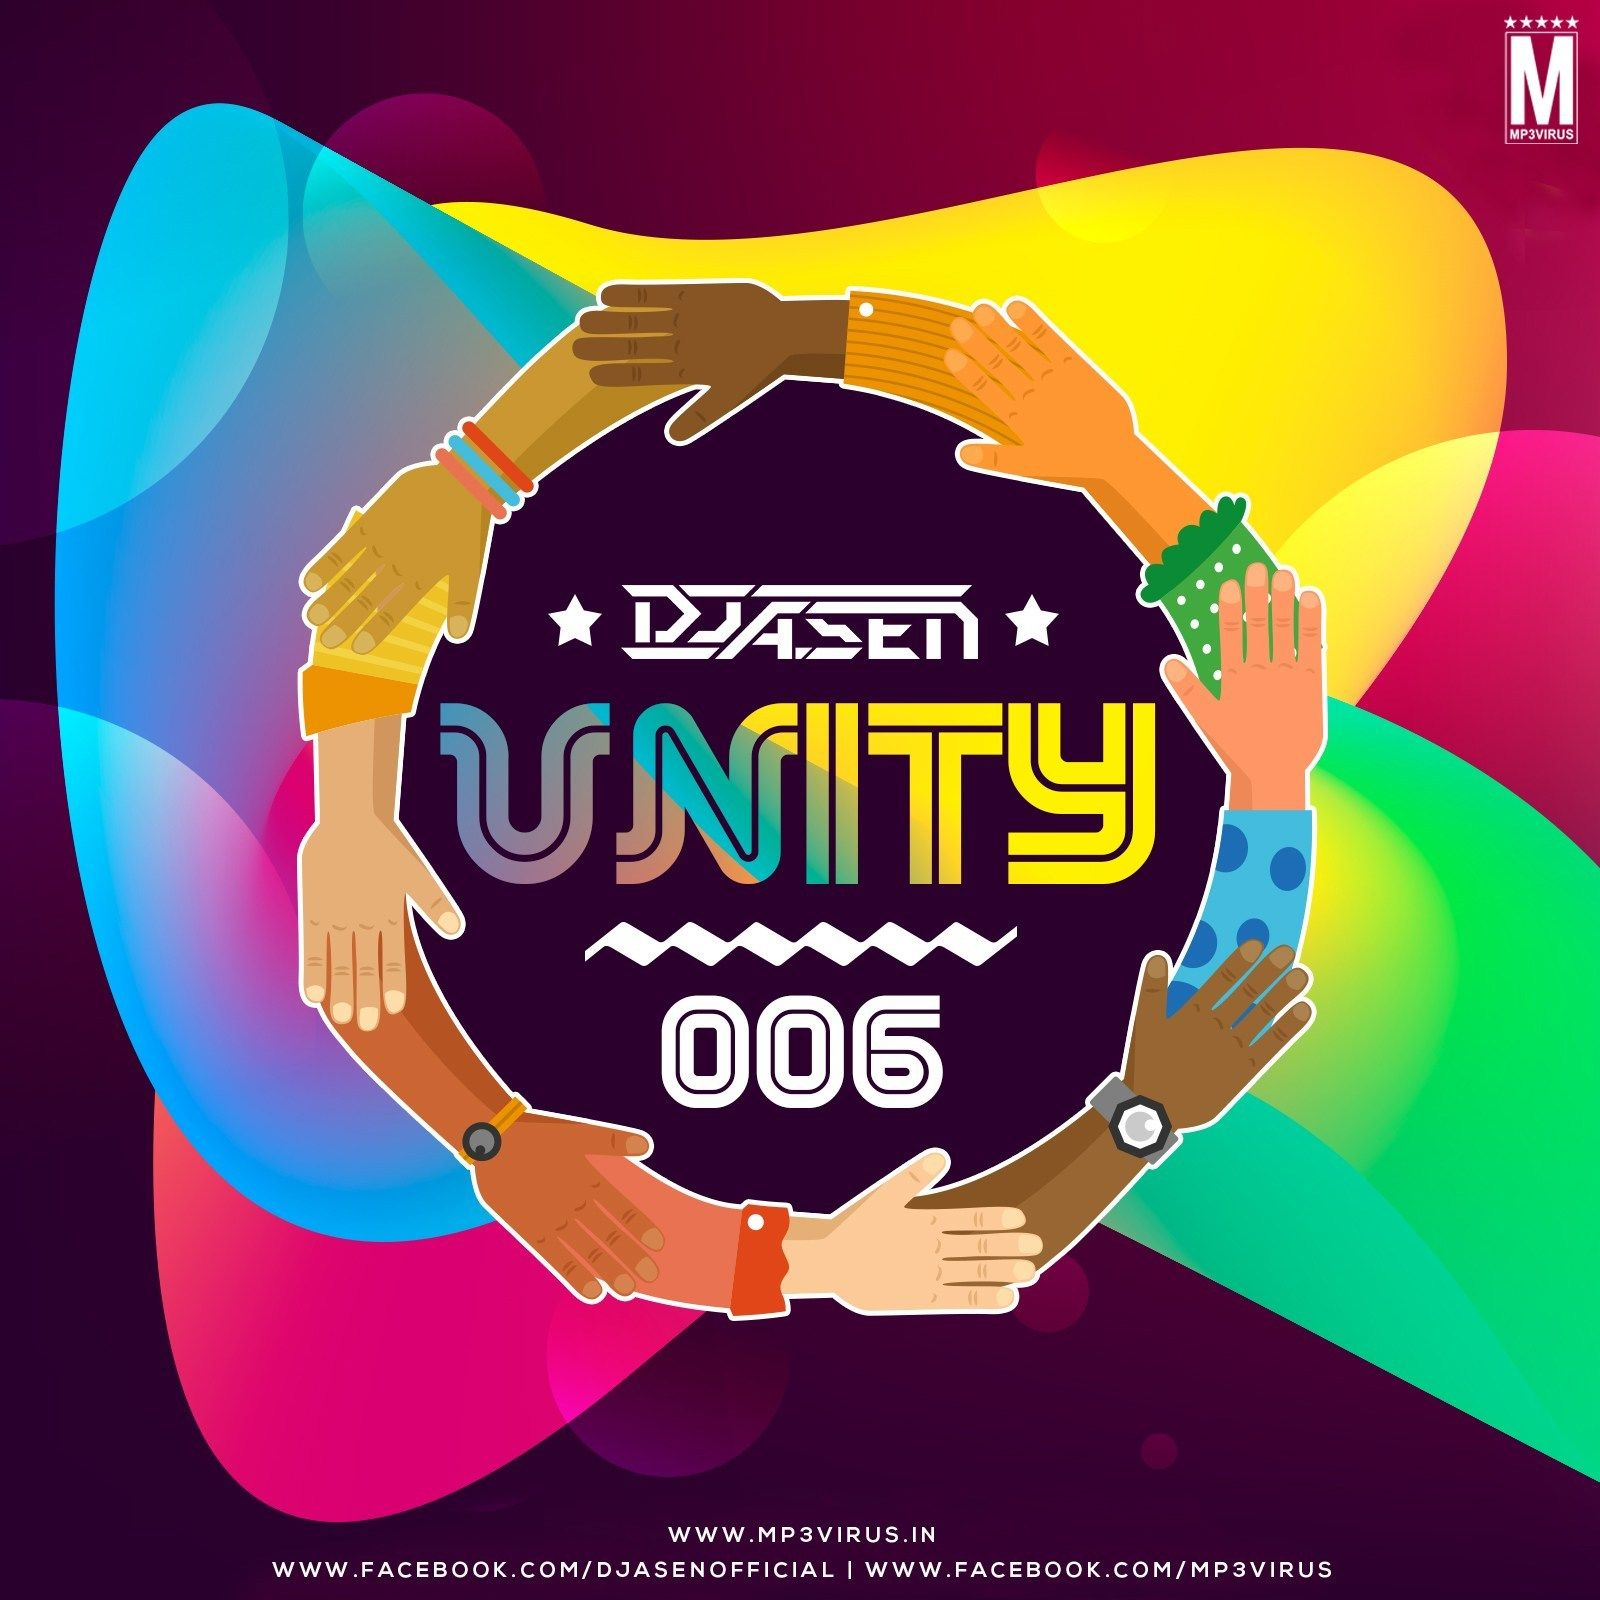 Unity 006 - DJ A Sen Latest DJ Remix Album Download Now | MP3Virus